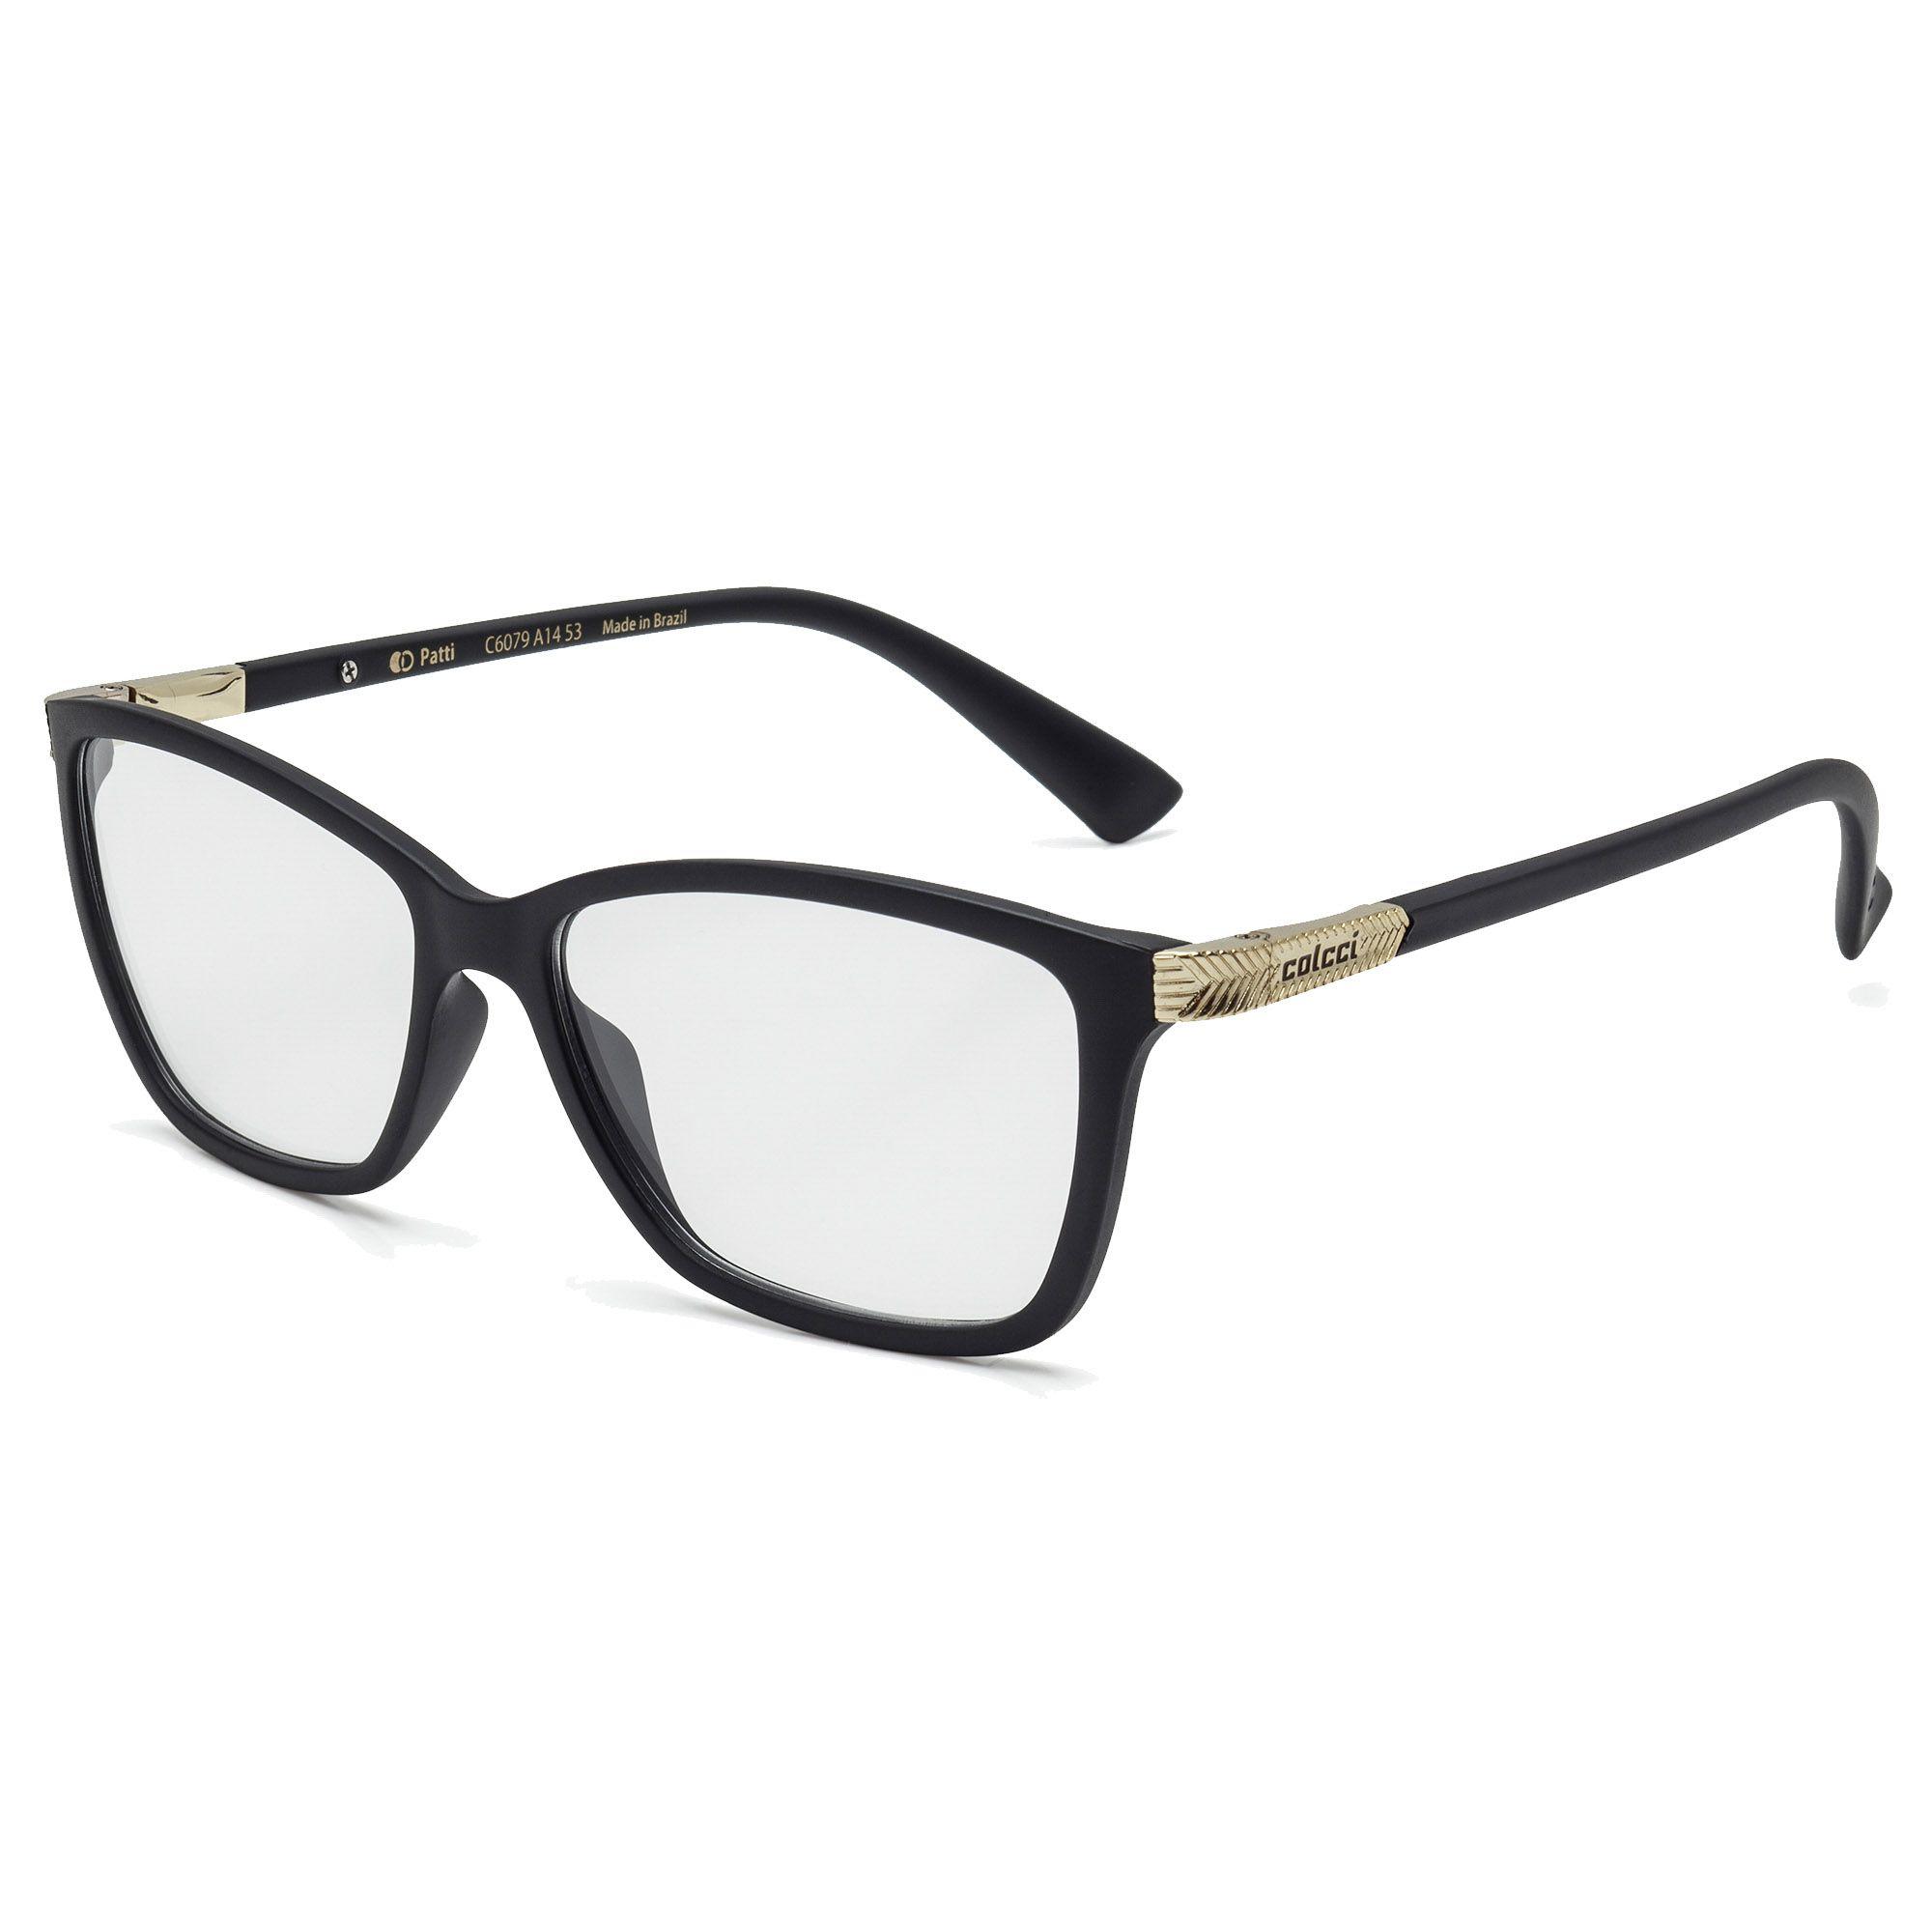 Óculos de Grau Feminino Colcci Patti C6079A1453